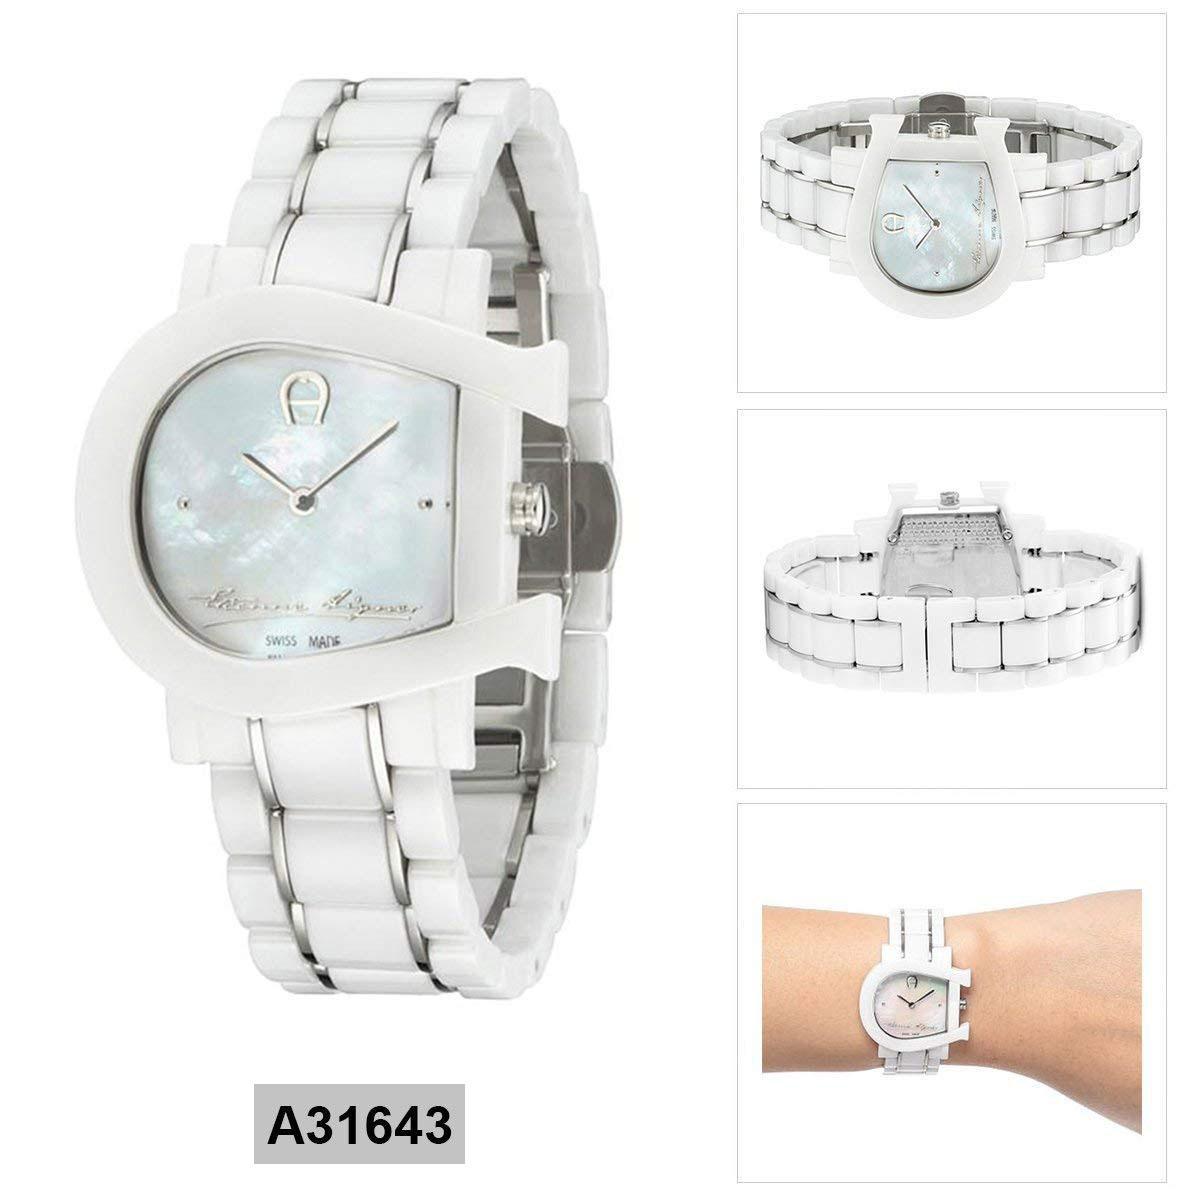 Harga Jam Gelang Set Aigner Date Update 2018 A17210 Belluno Hitam Gold Tangan Wanita Genoa Due White Ceramic Case Bracelet Ladies A31643